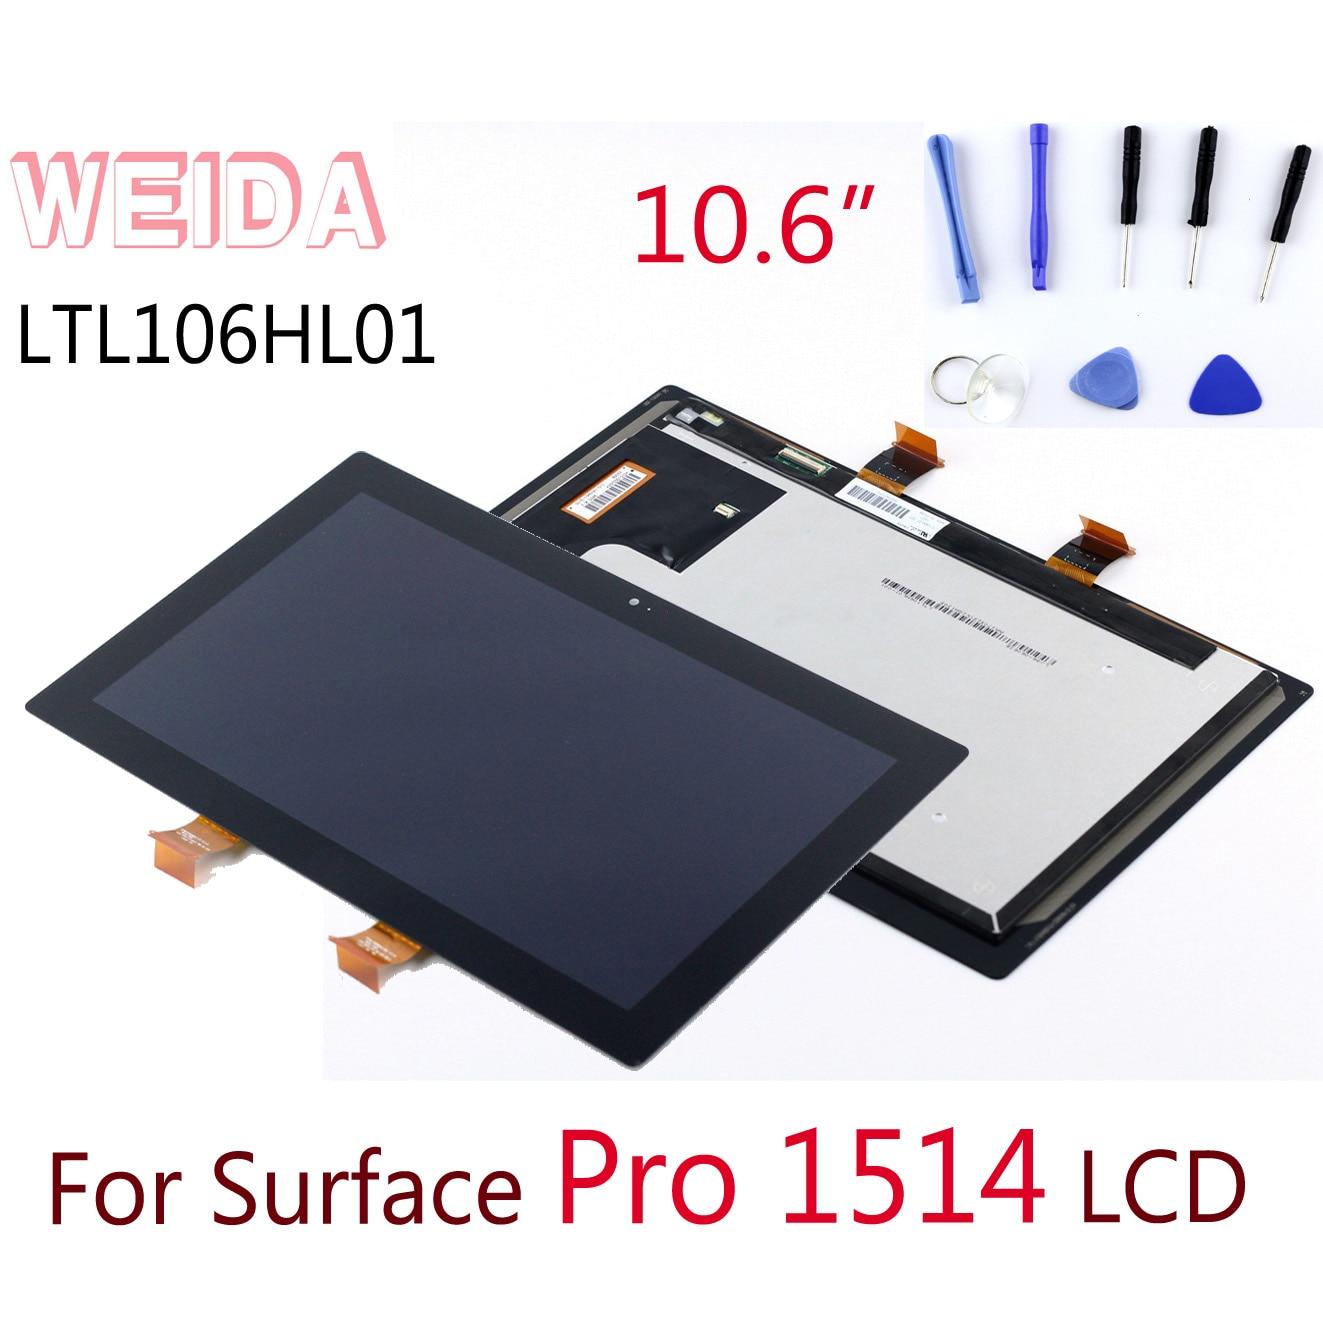 WEIDA Pro1 LCD 10.6